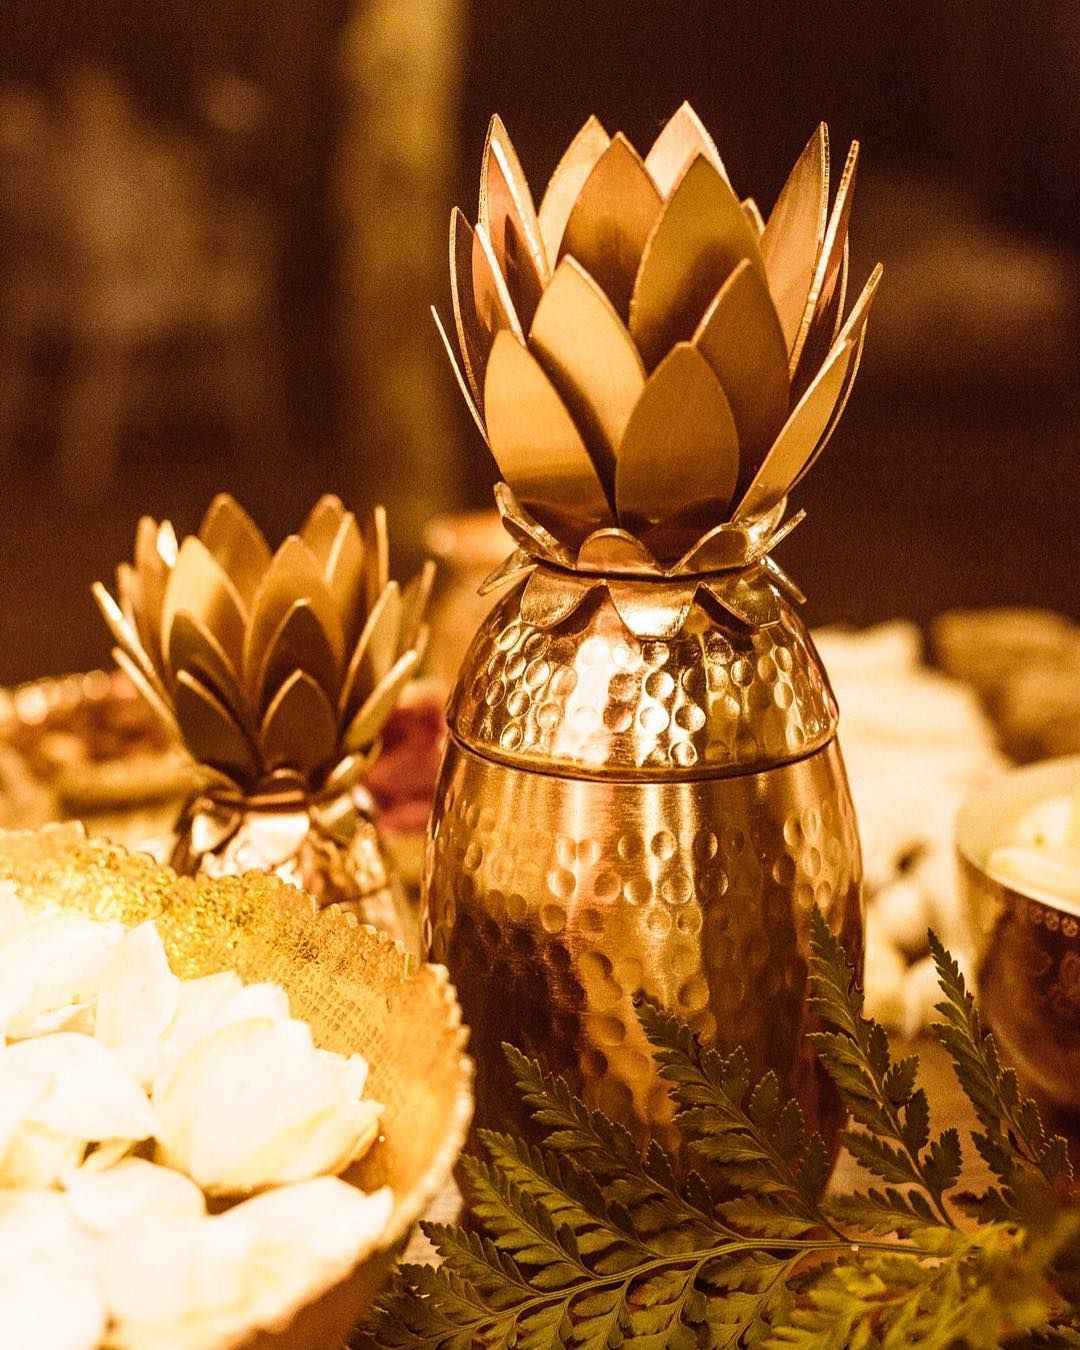 Pineapple sumale a tu mesa objetos de decoraci n que for Objetos de decoracion online